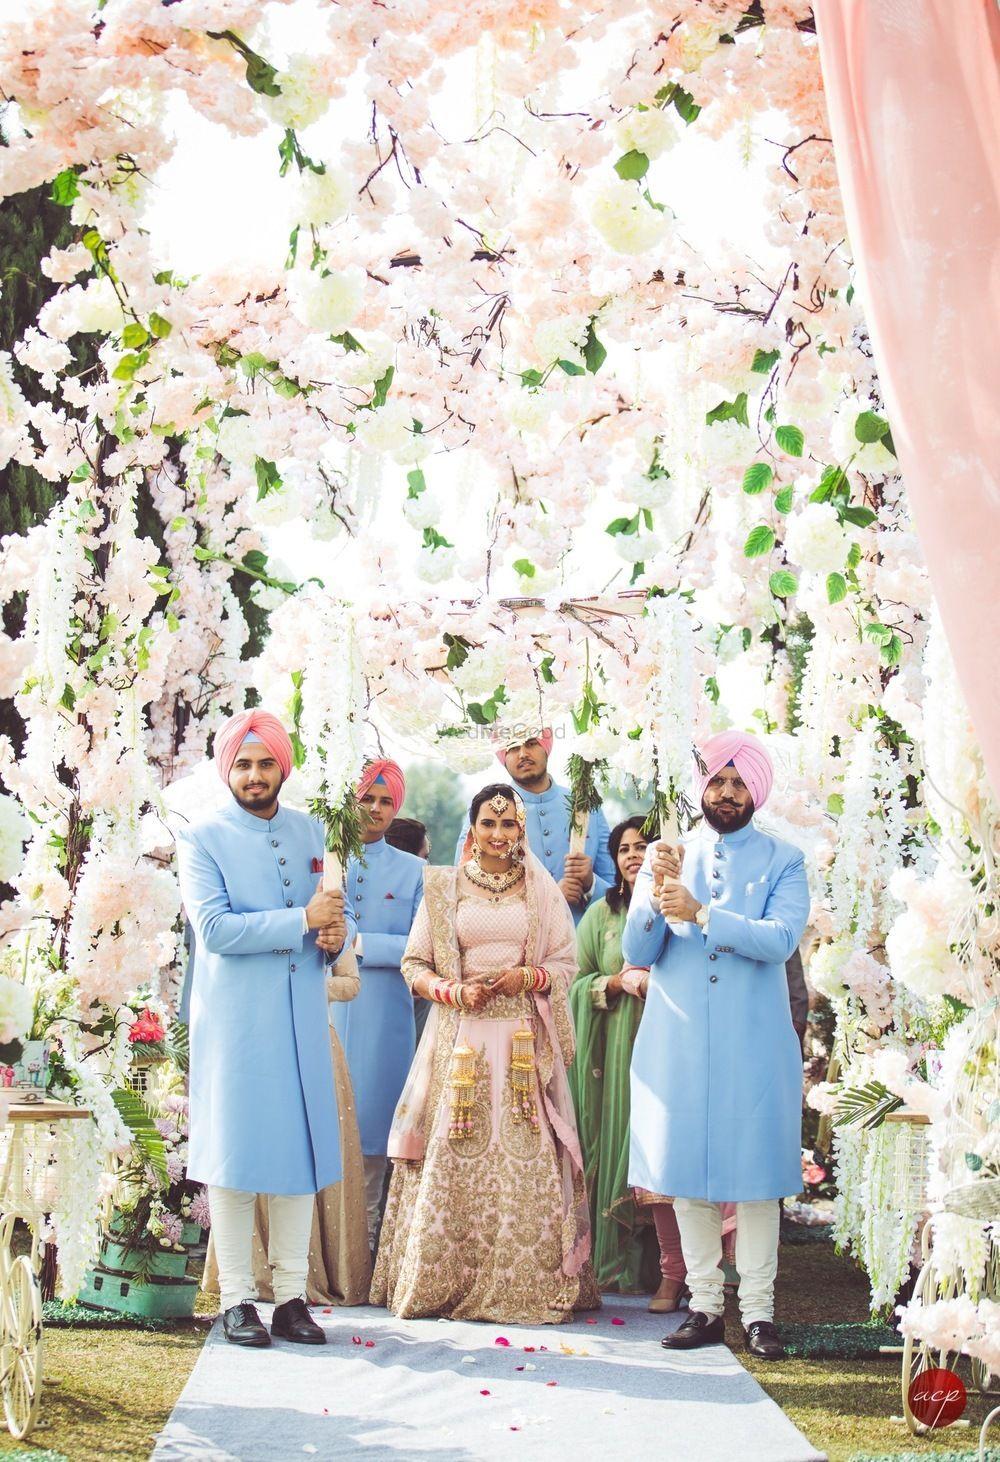 Photo of Pastel floral decor ideas with bridal entry portrait